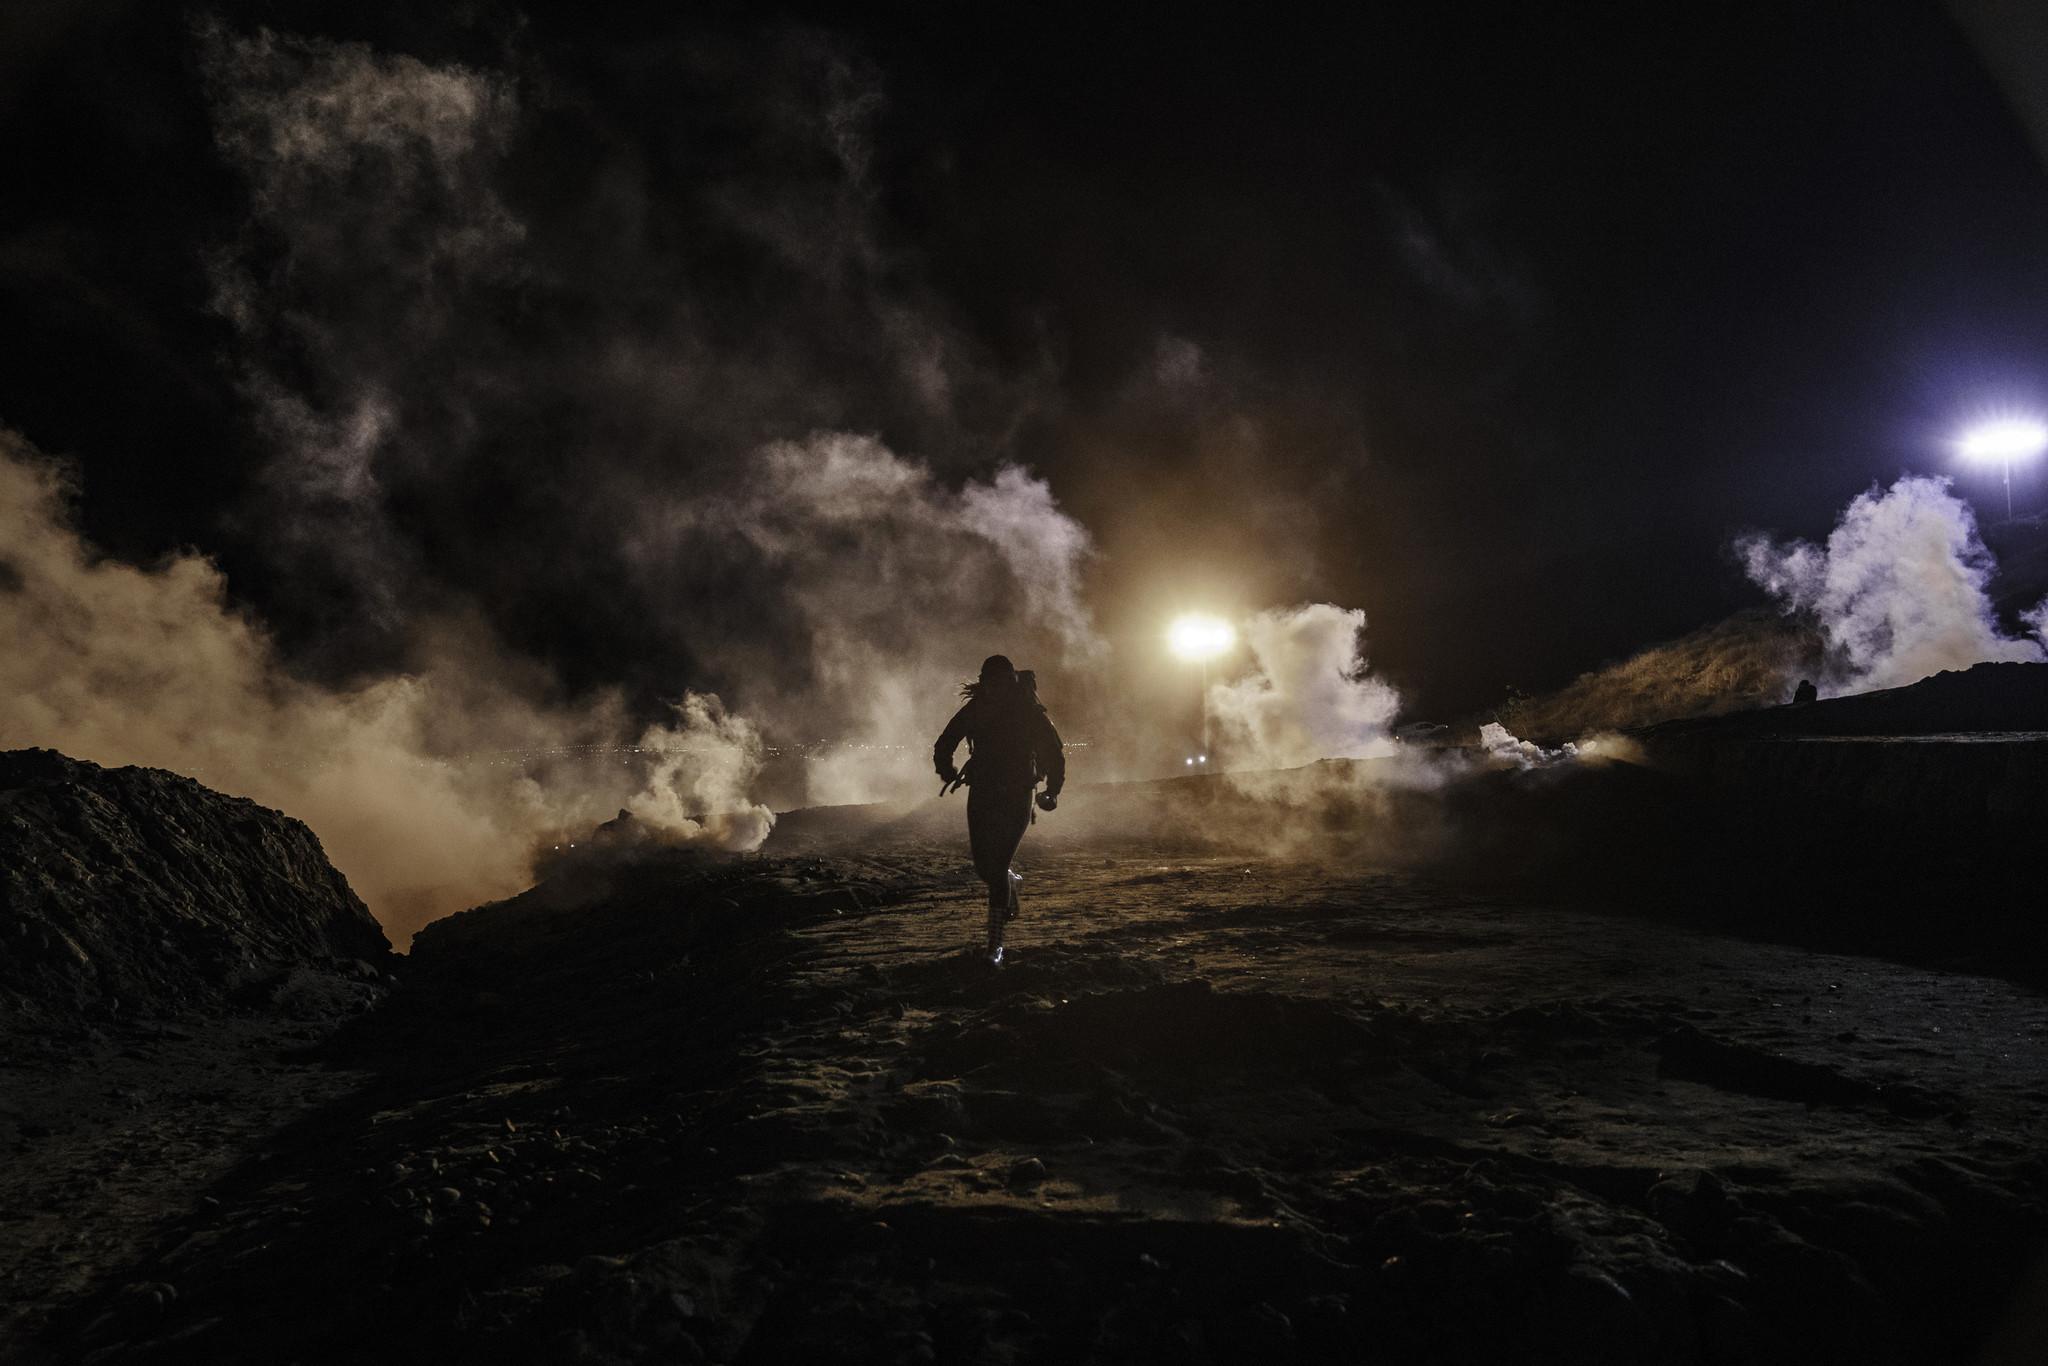 Border Patrol fires tear gas, pepper spray on migrants